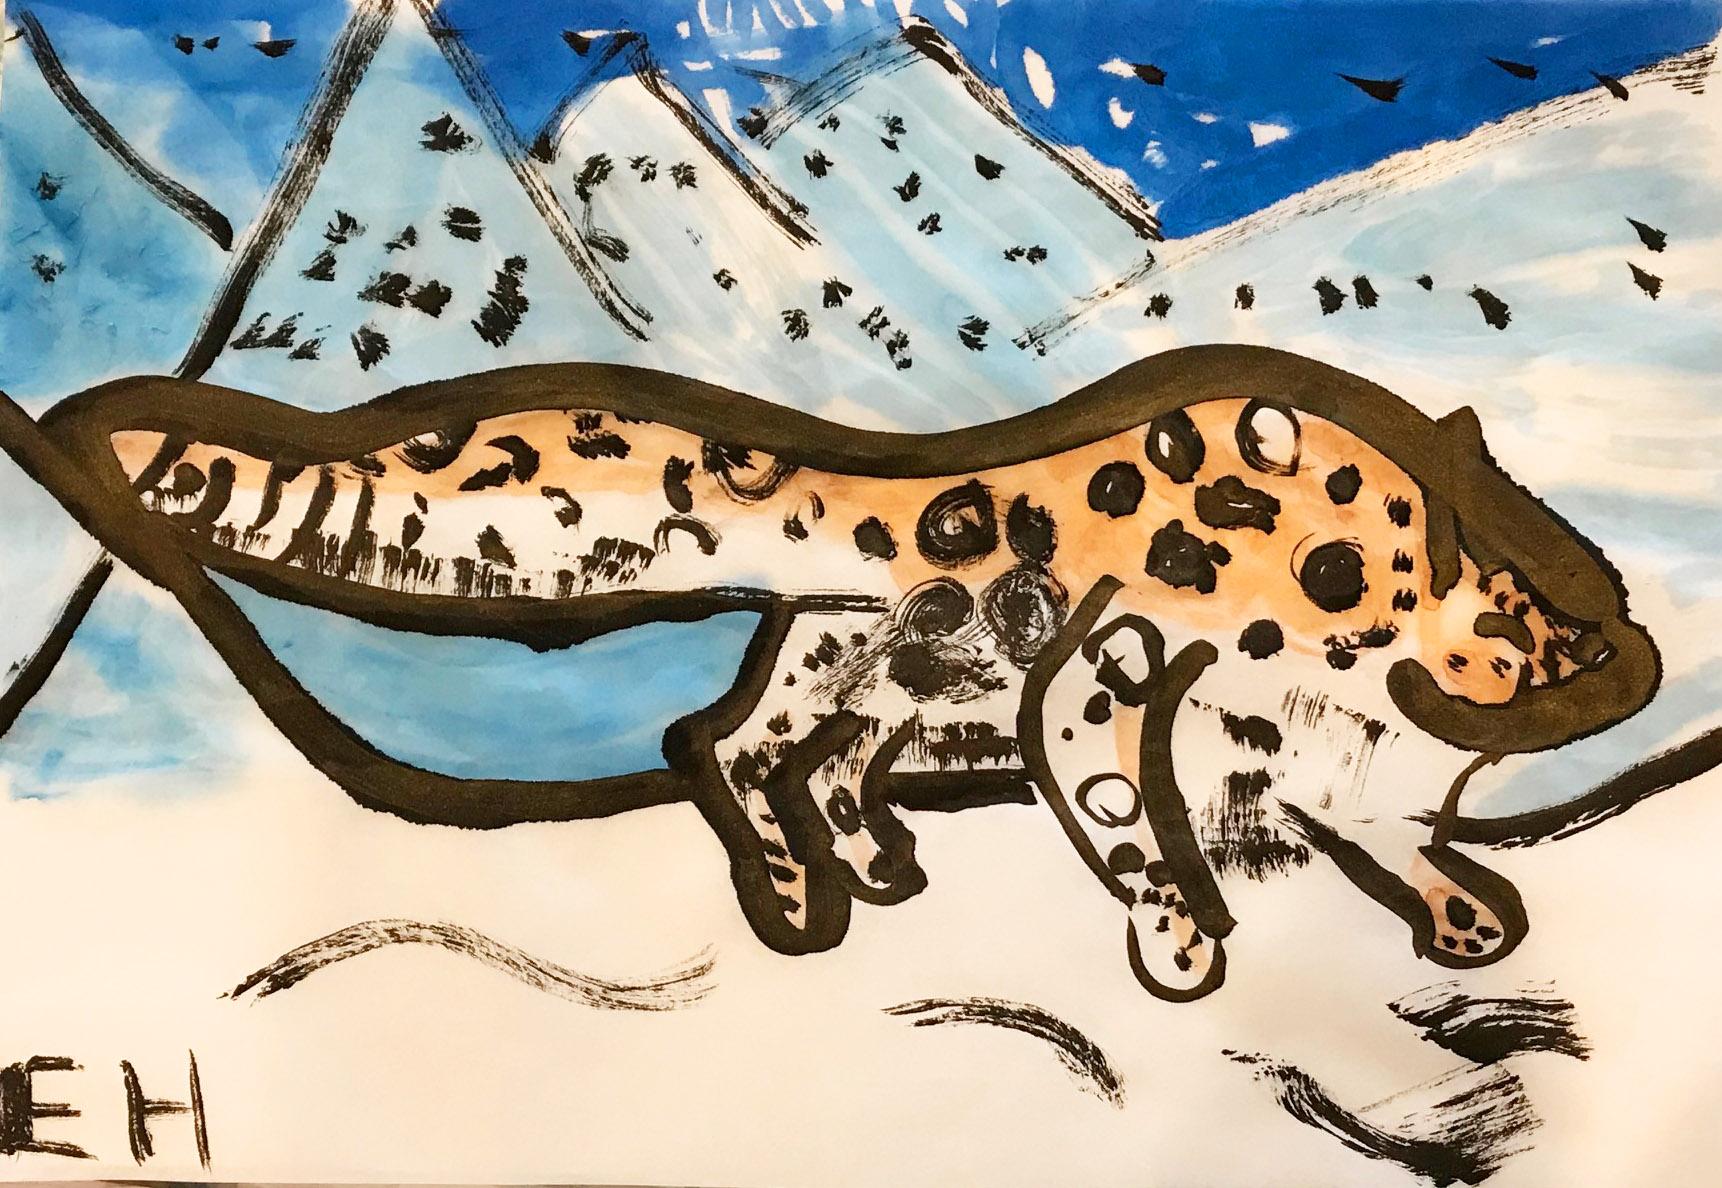 Snow Leopard by Elise, age 7